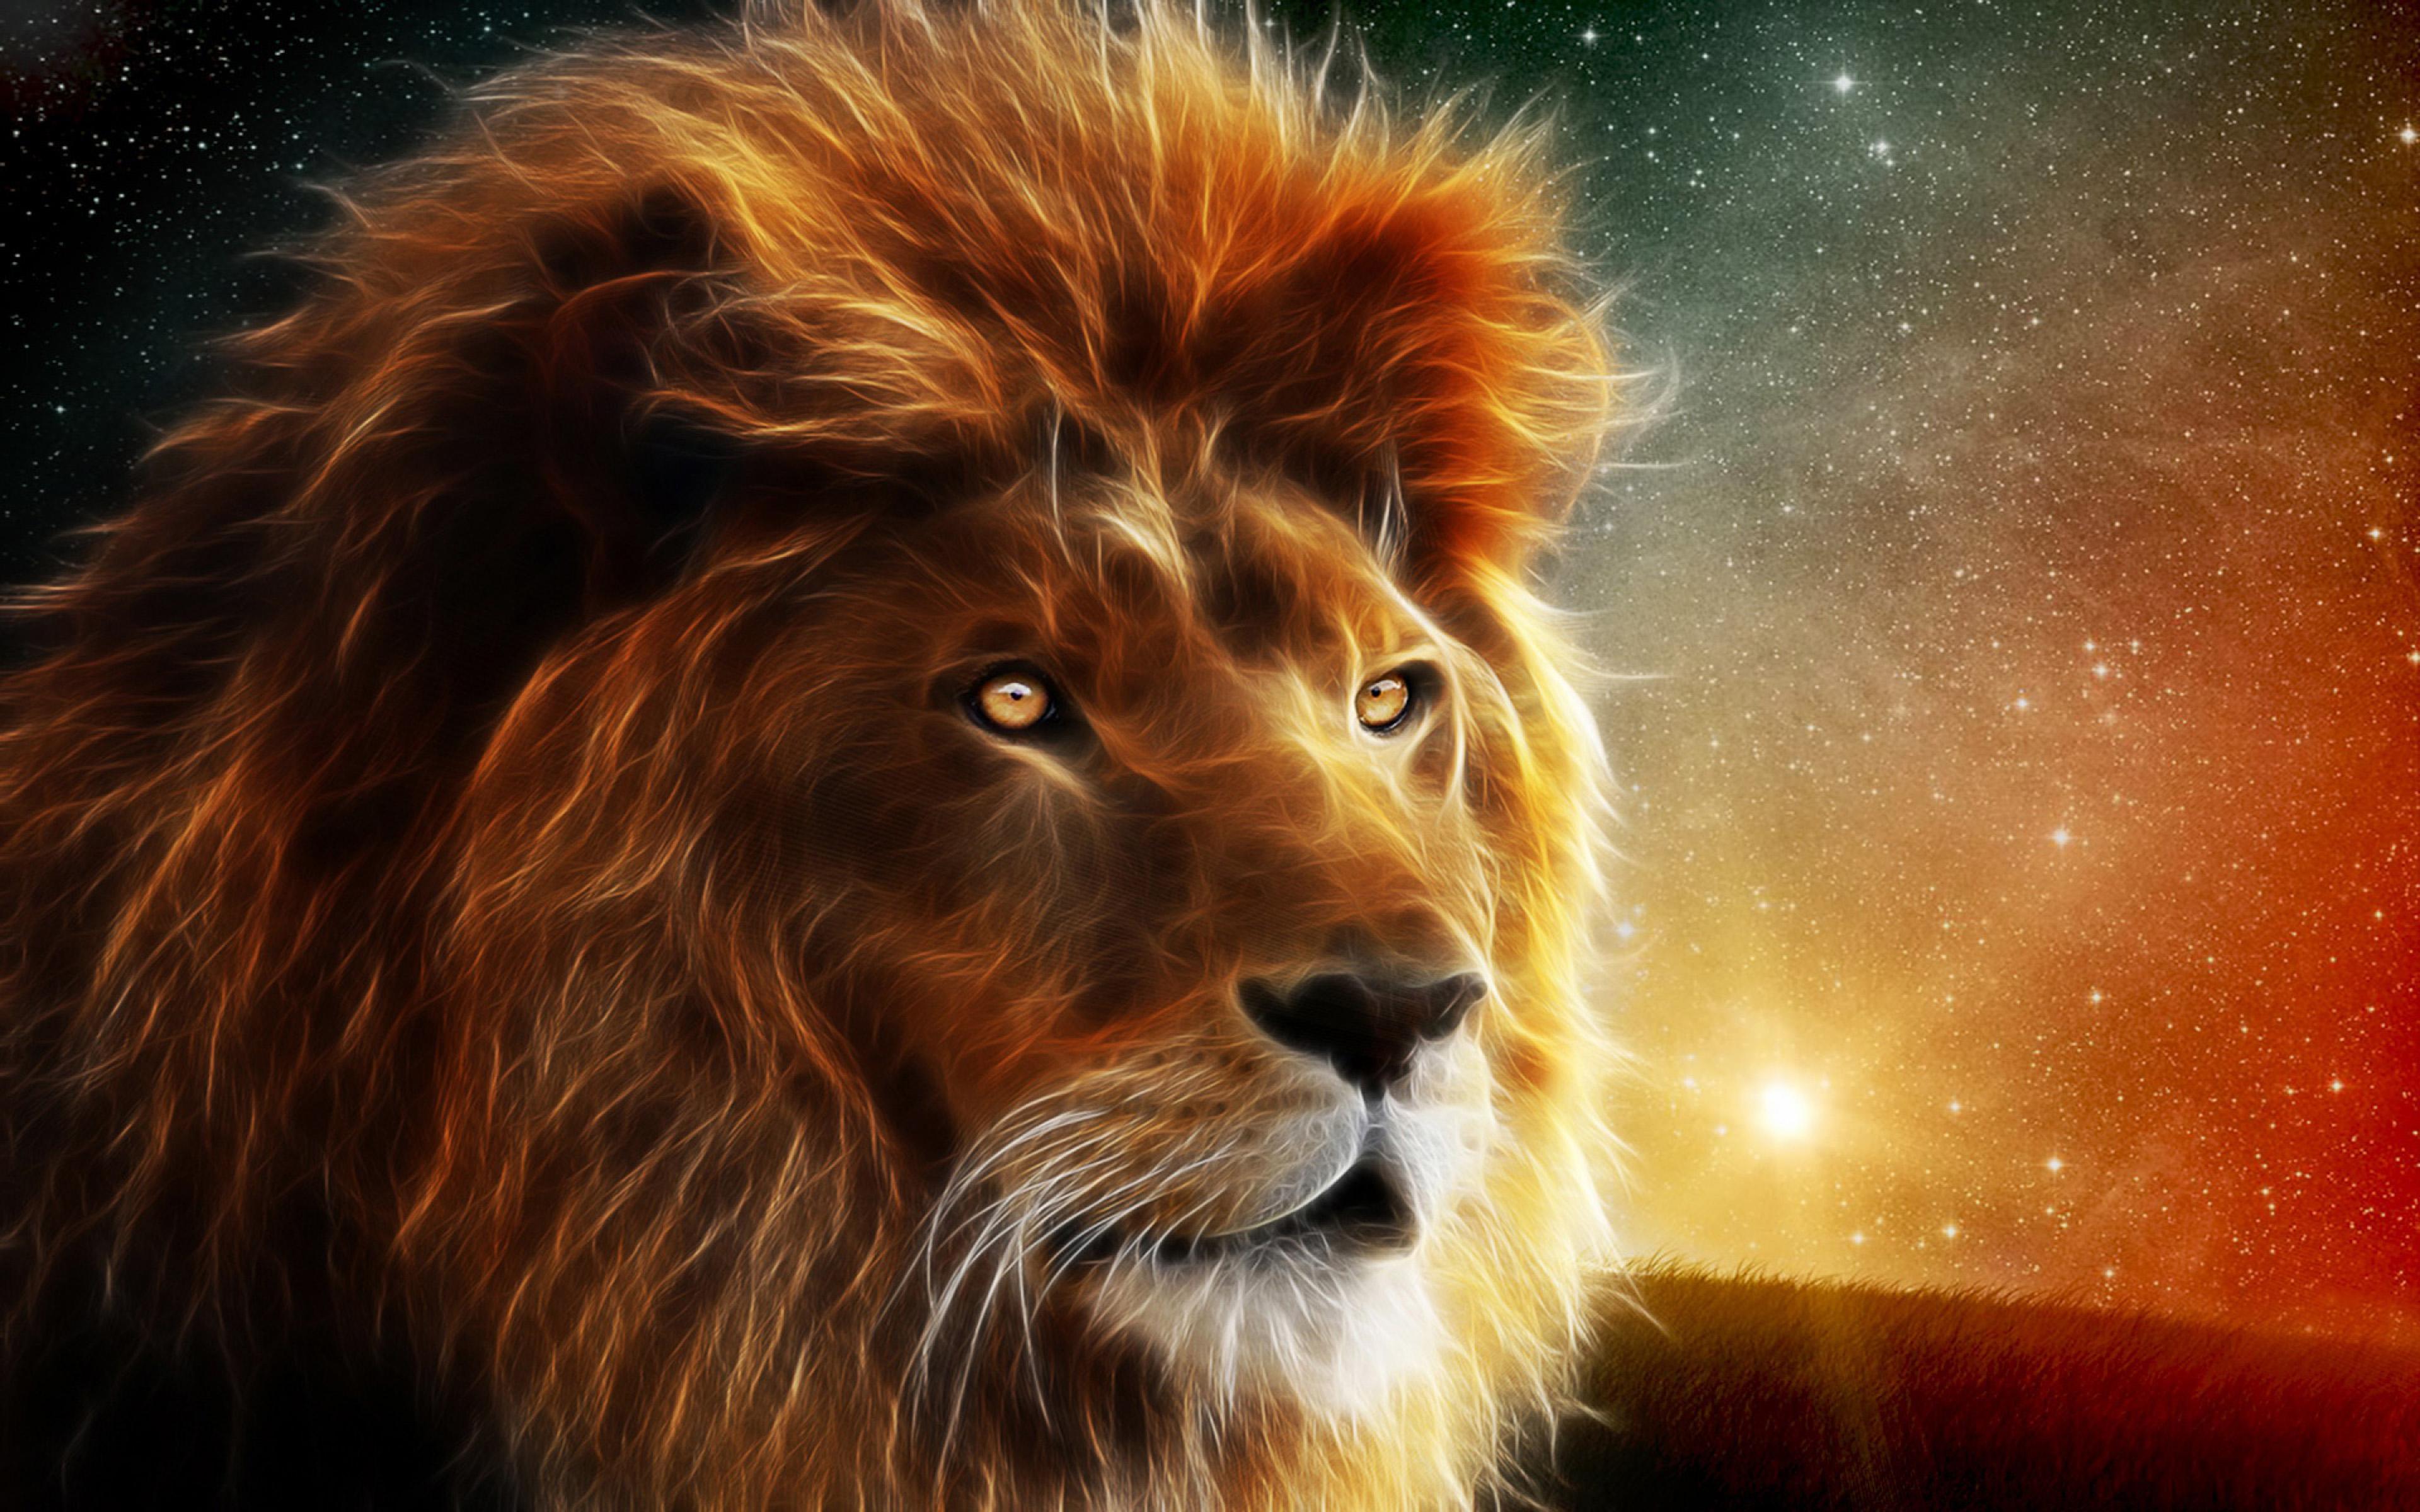 Download Original Resolution - Lion Wallpaper Download Hd , HD Wallpaper & Backgrounds